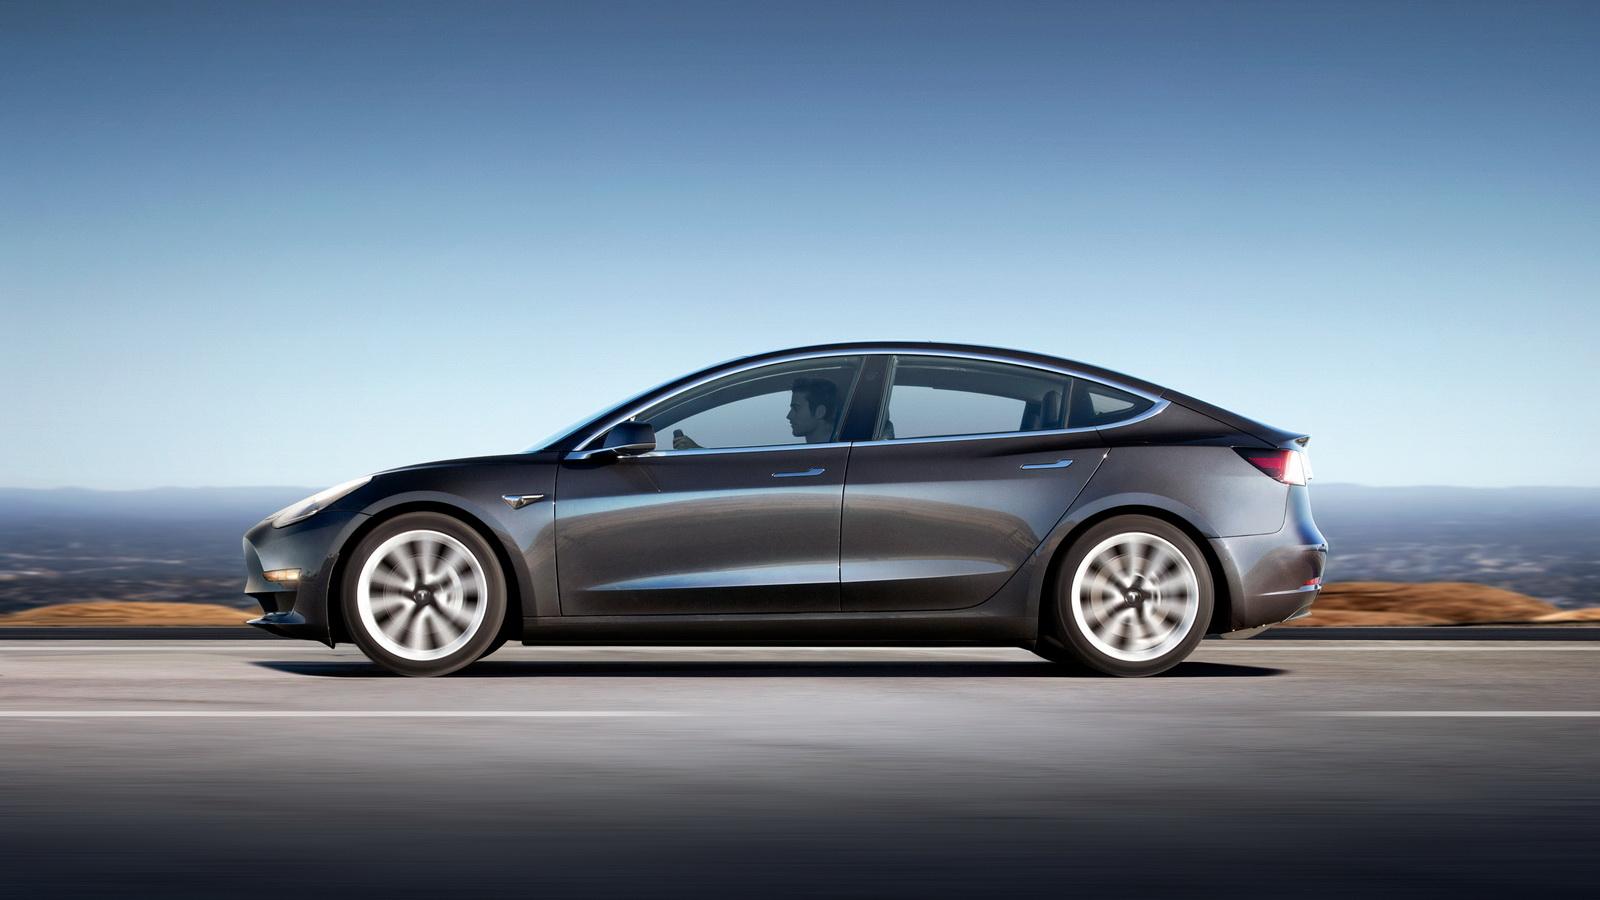 У Tesla пояснили причини  затримки виробництва Model 3